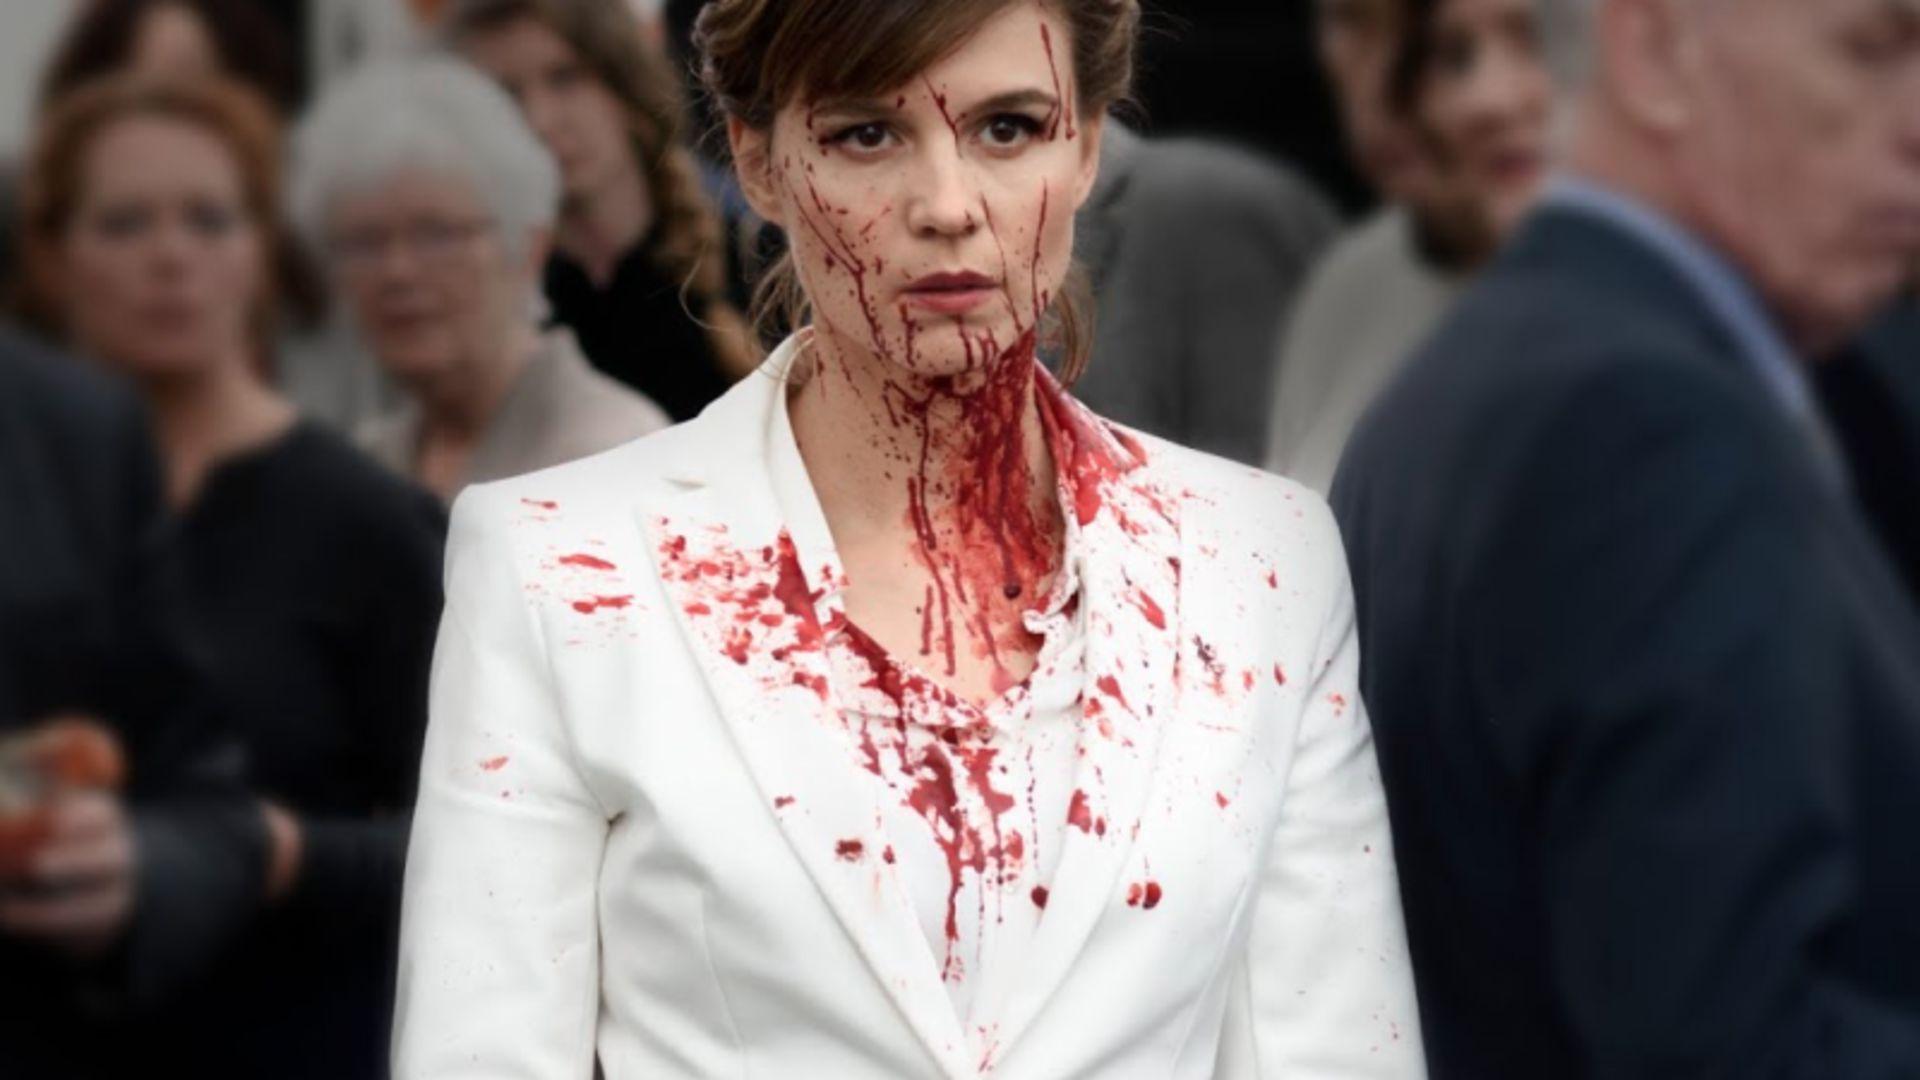 Nederlandse horrorfilm 'De Kuthoer' verkocht aan vier prominente landen